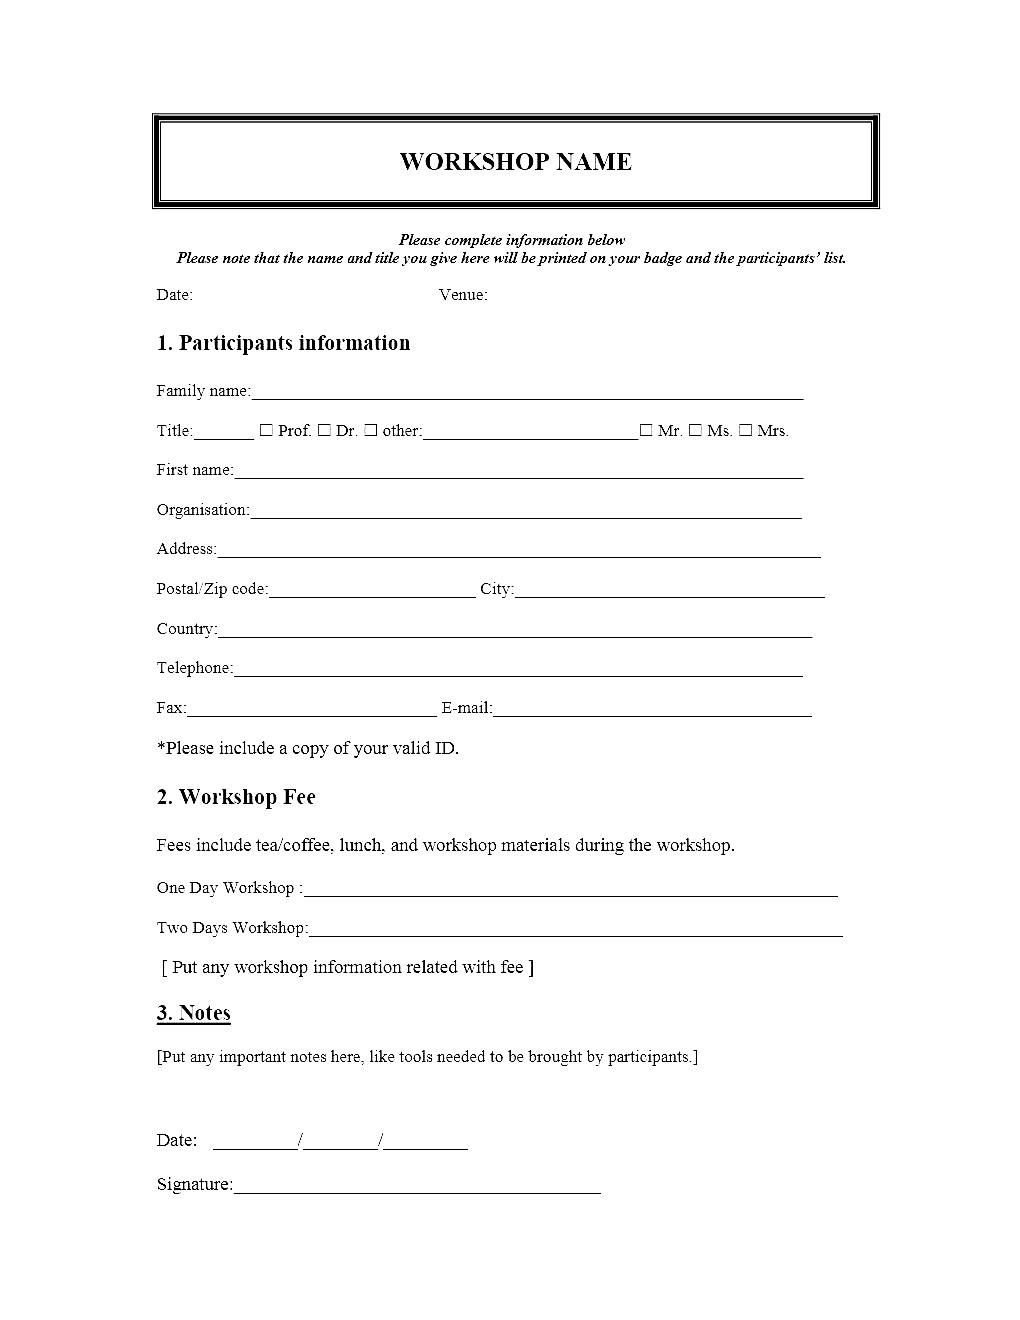 Registration form Template Microsoft Word event Registration form Template Microsoft Word